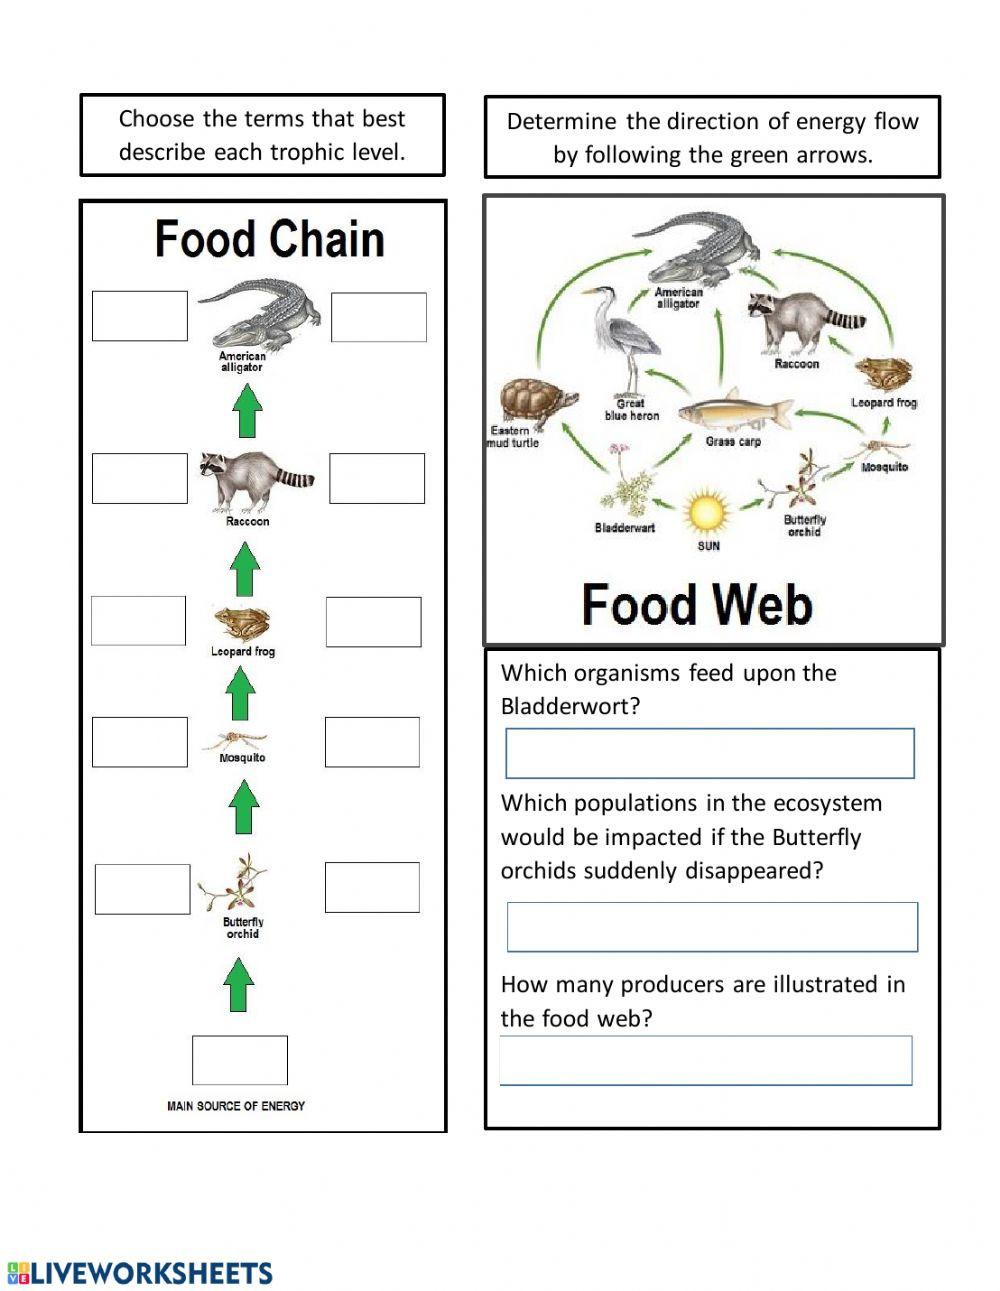 Live Work Sheet Energy Flow in Ecosystems bu xv